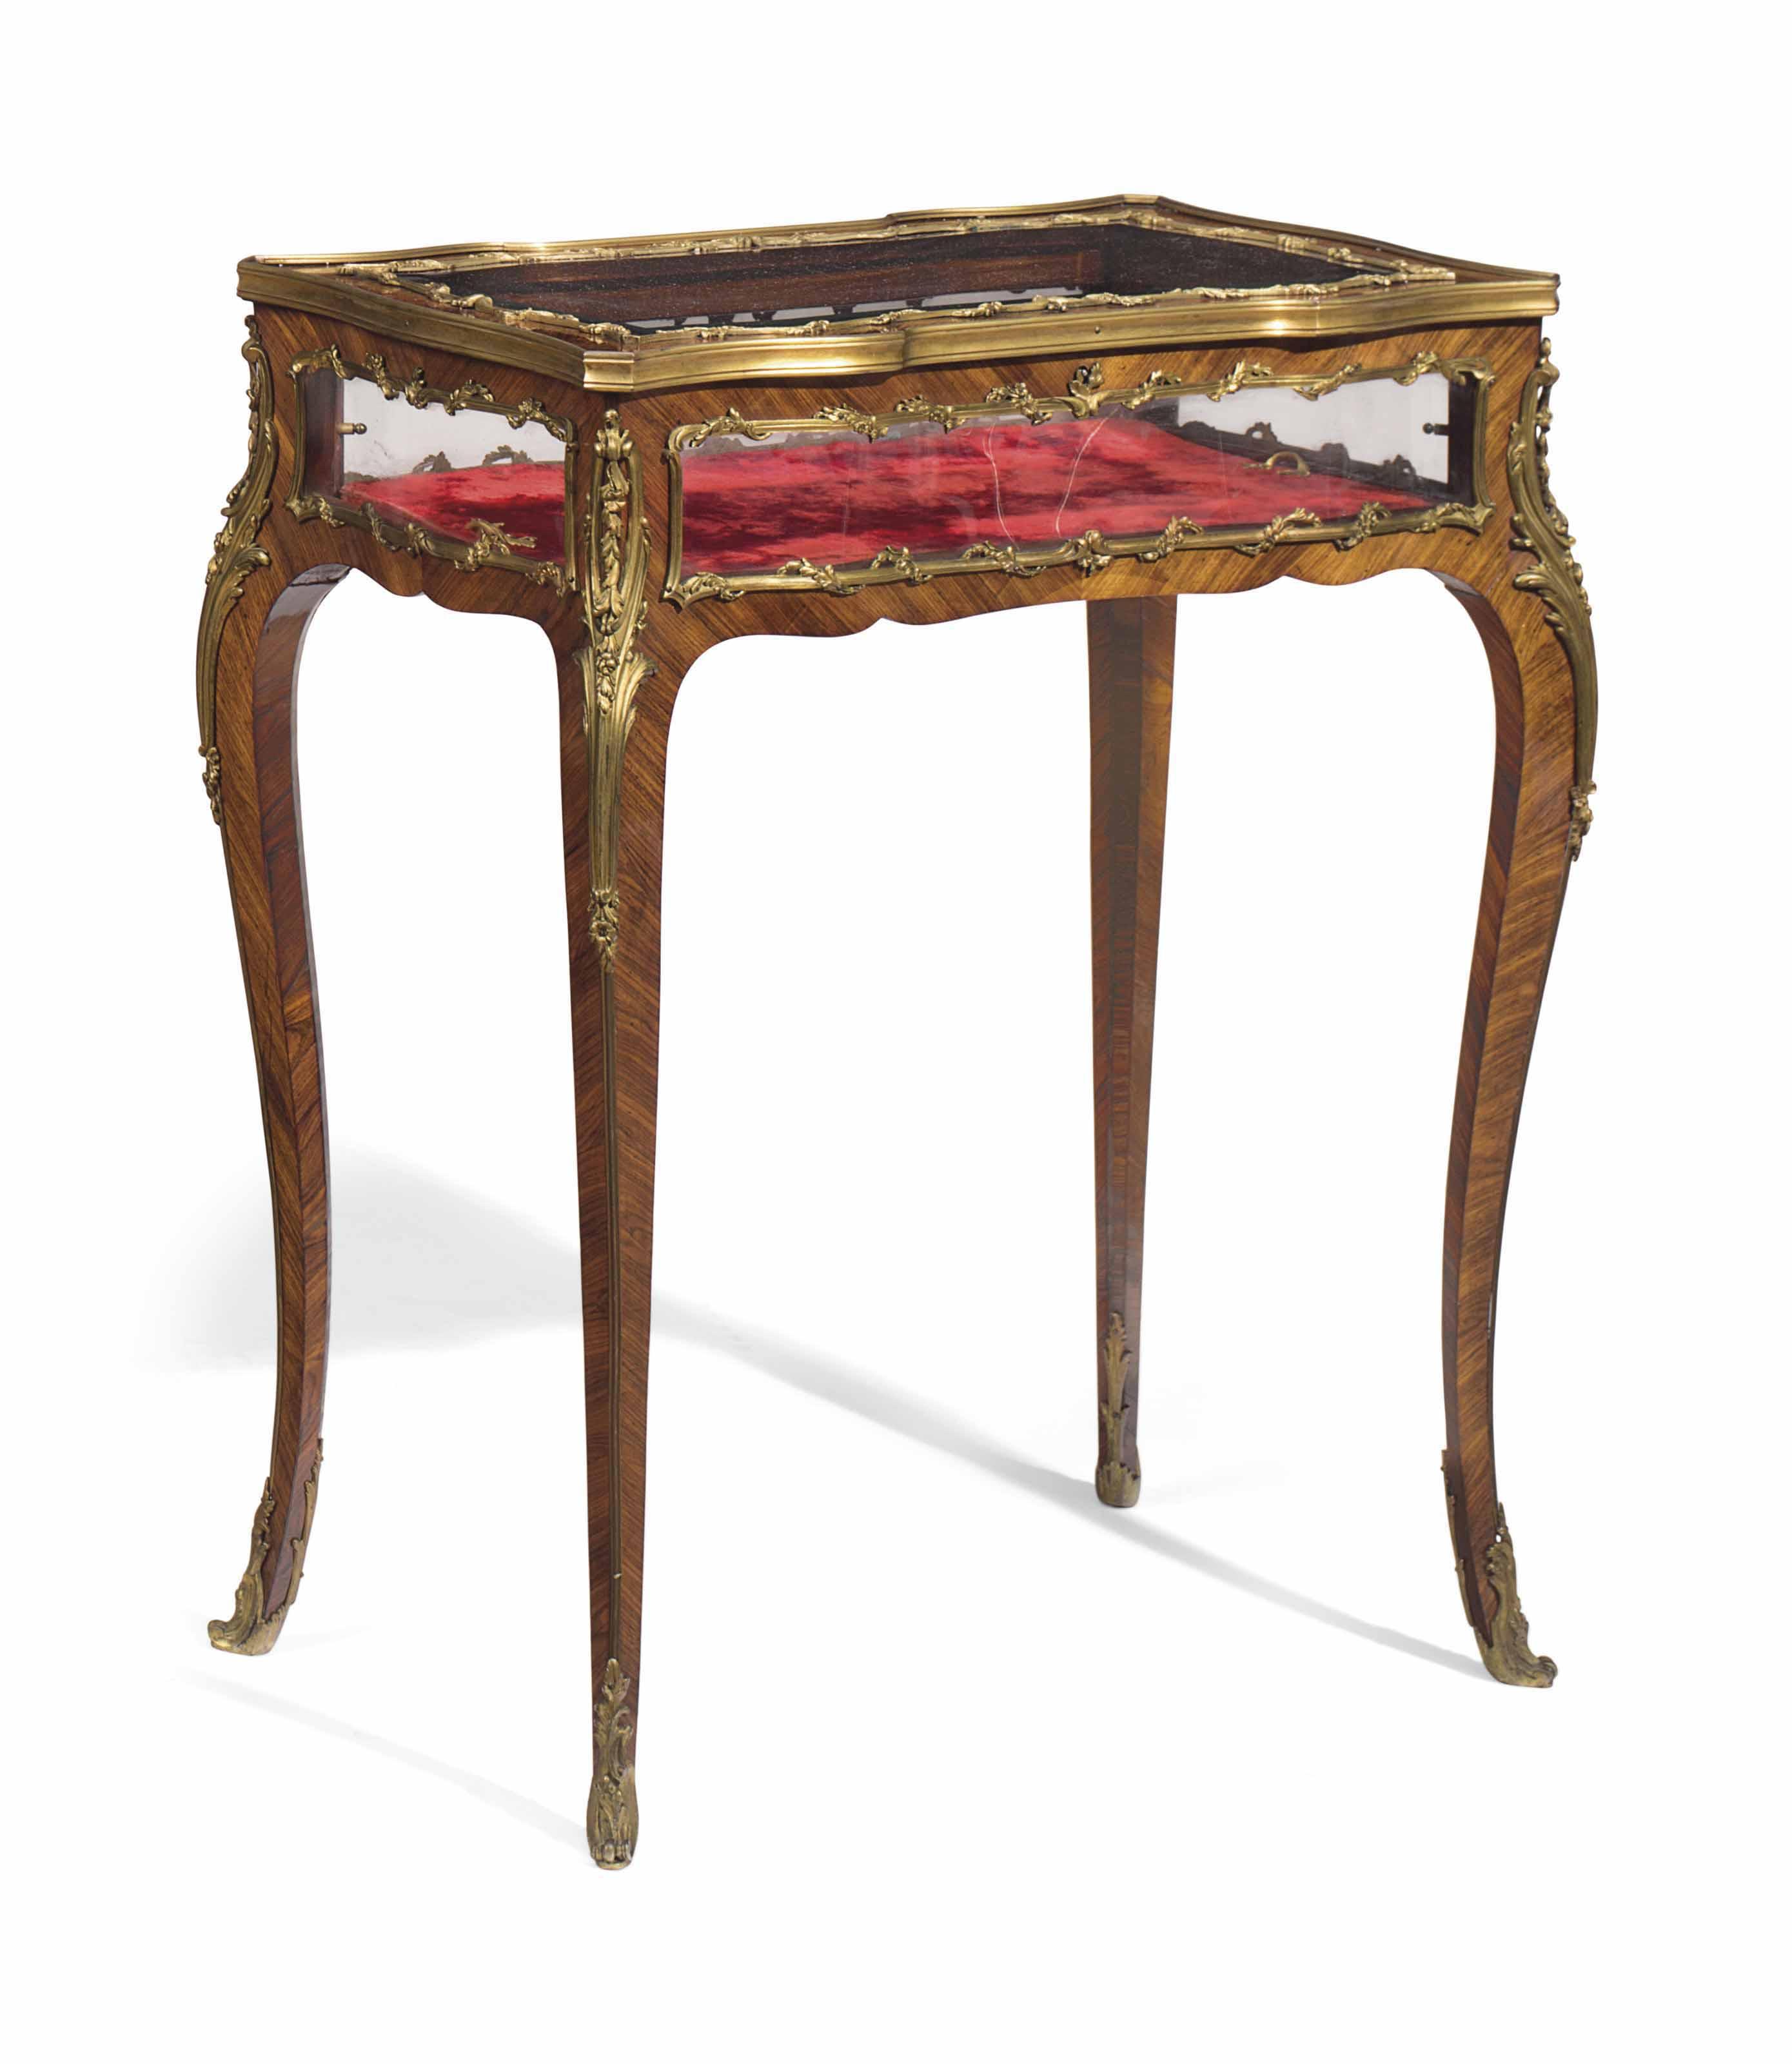 A FRENCH ORMOLU-MOUNTED KINGWOOD VITRINE-TABLE